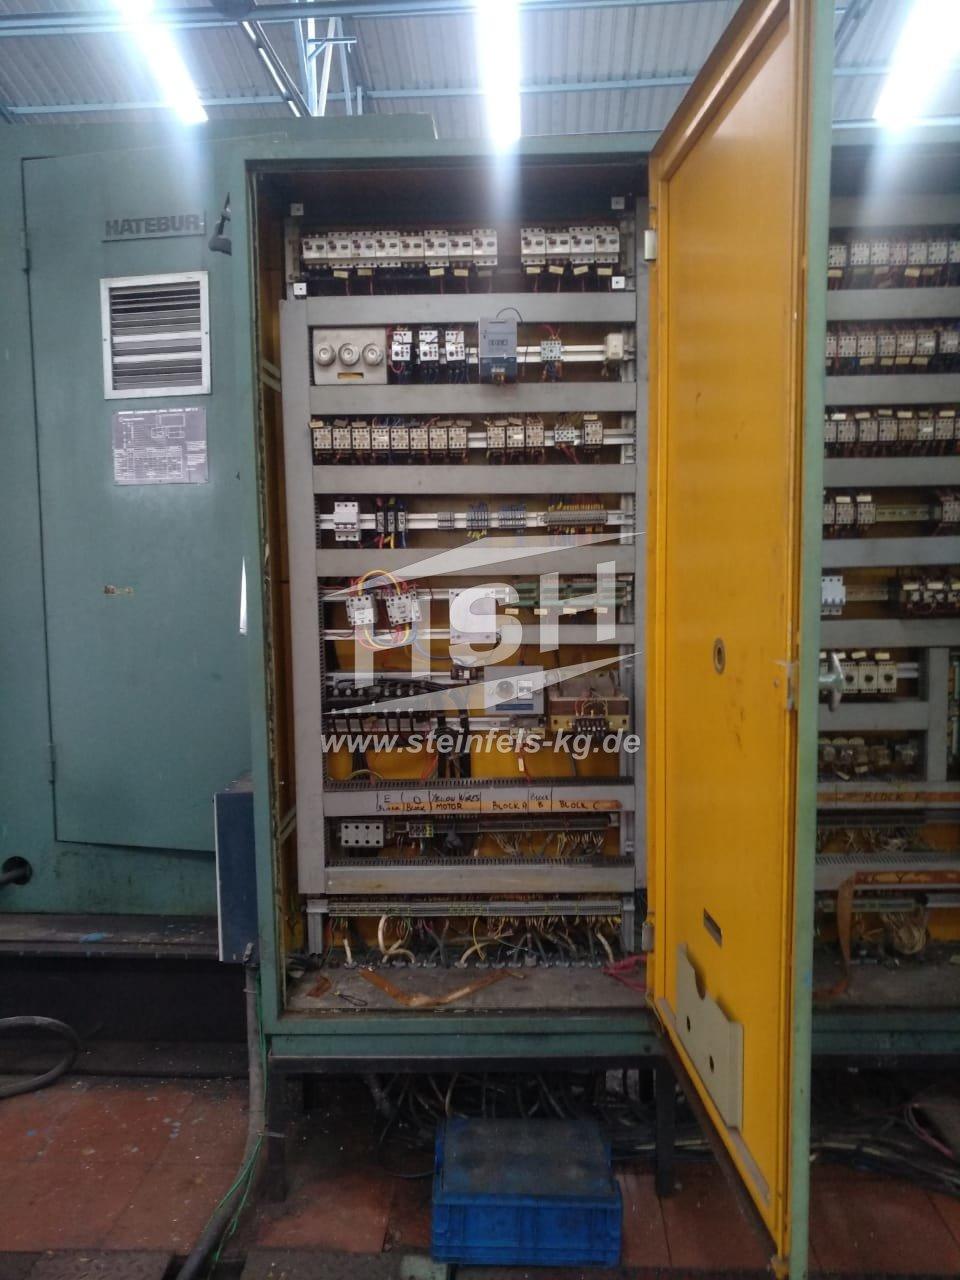 M08U/8274 – HATEBUR – AKP 3-5 – 1983 – 14 mm